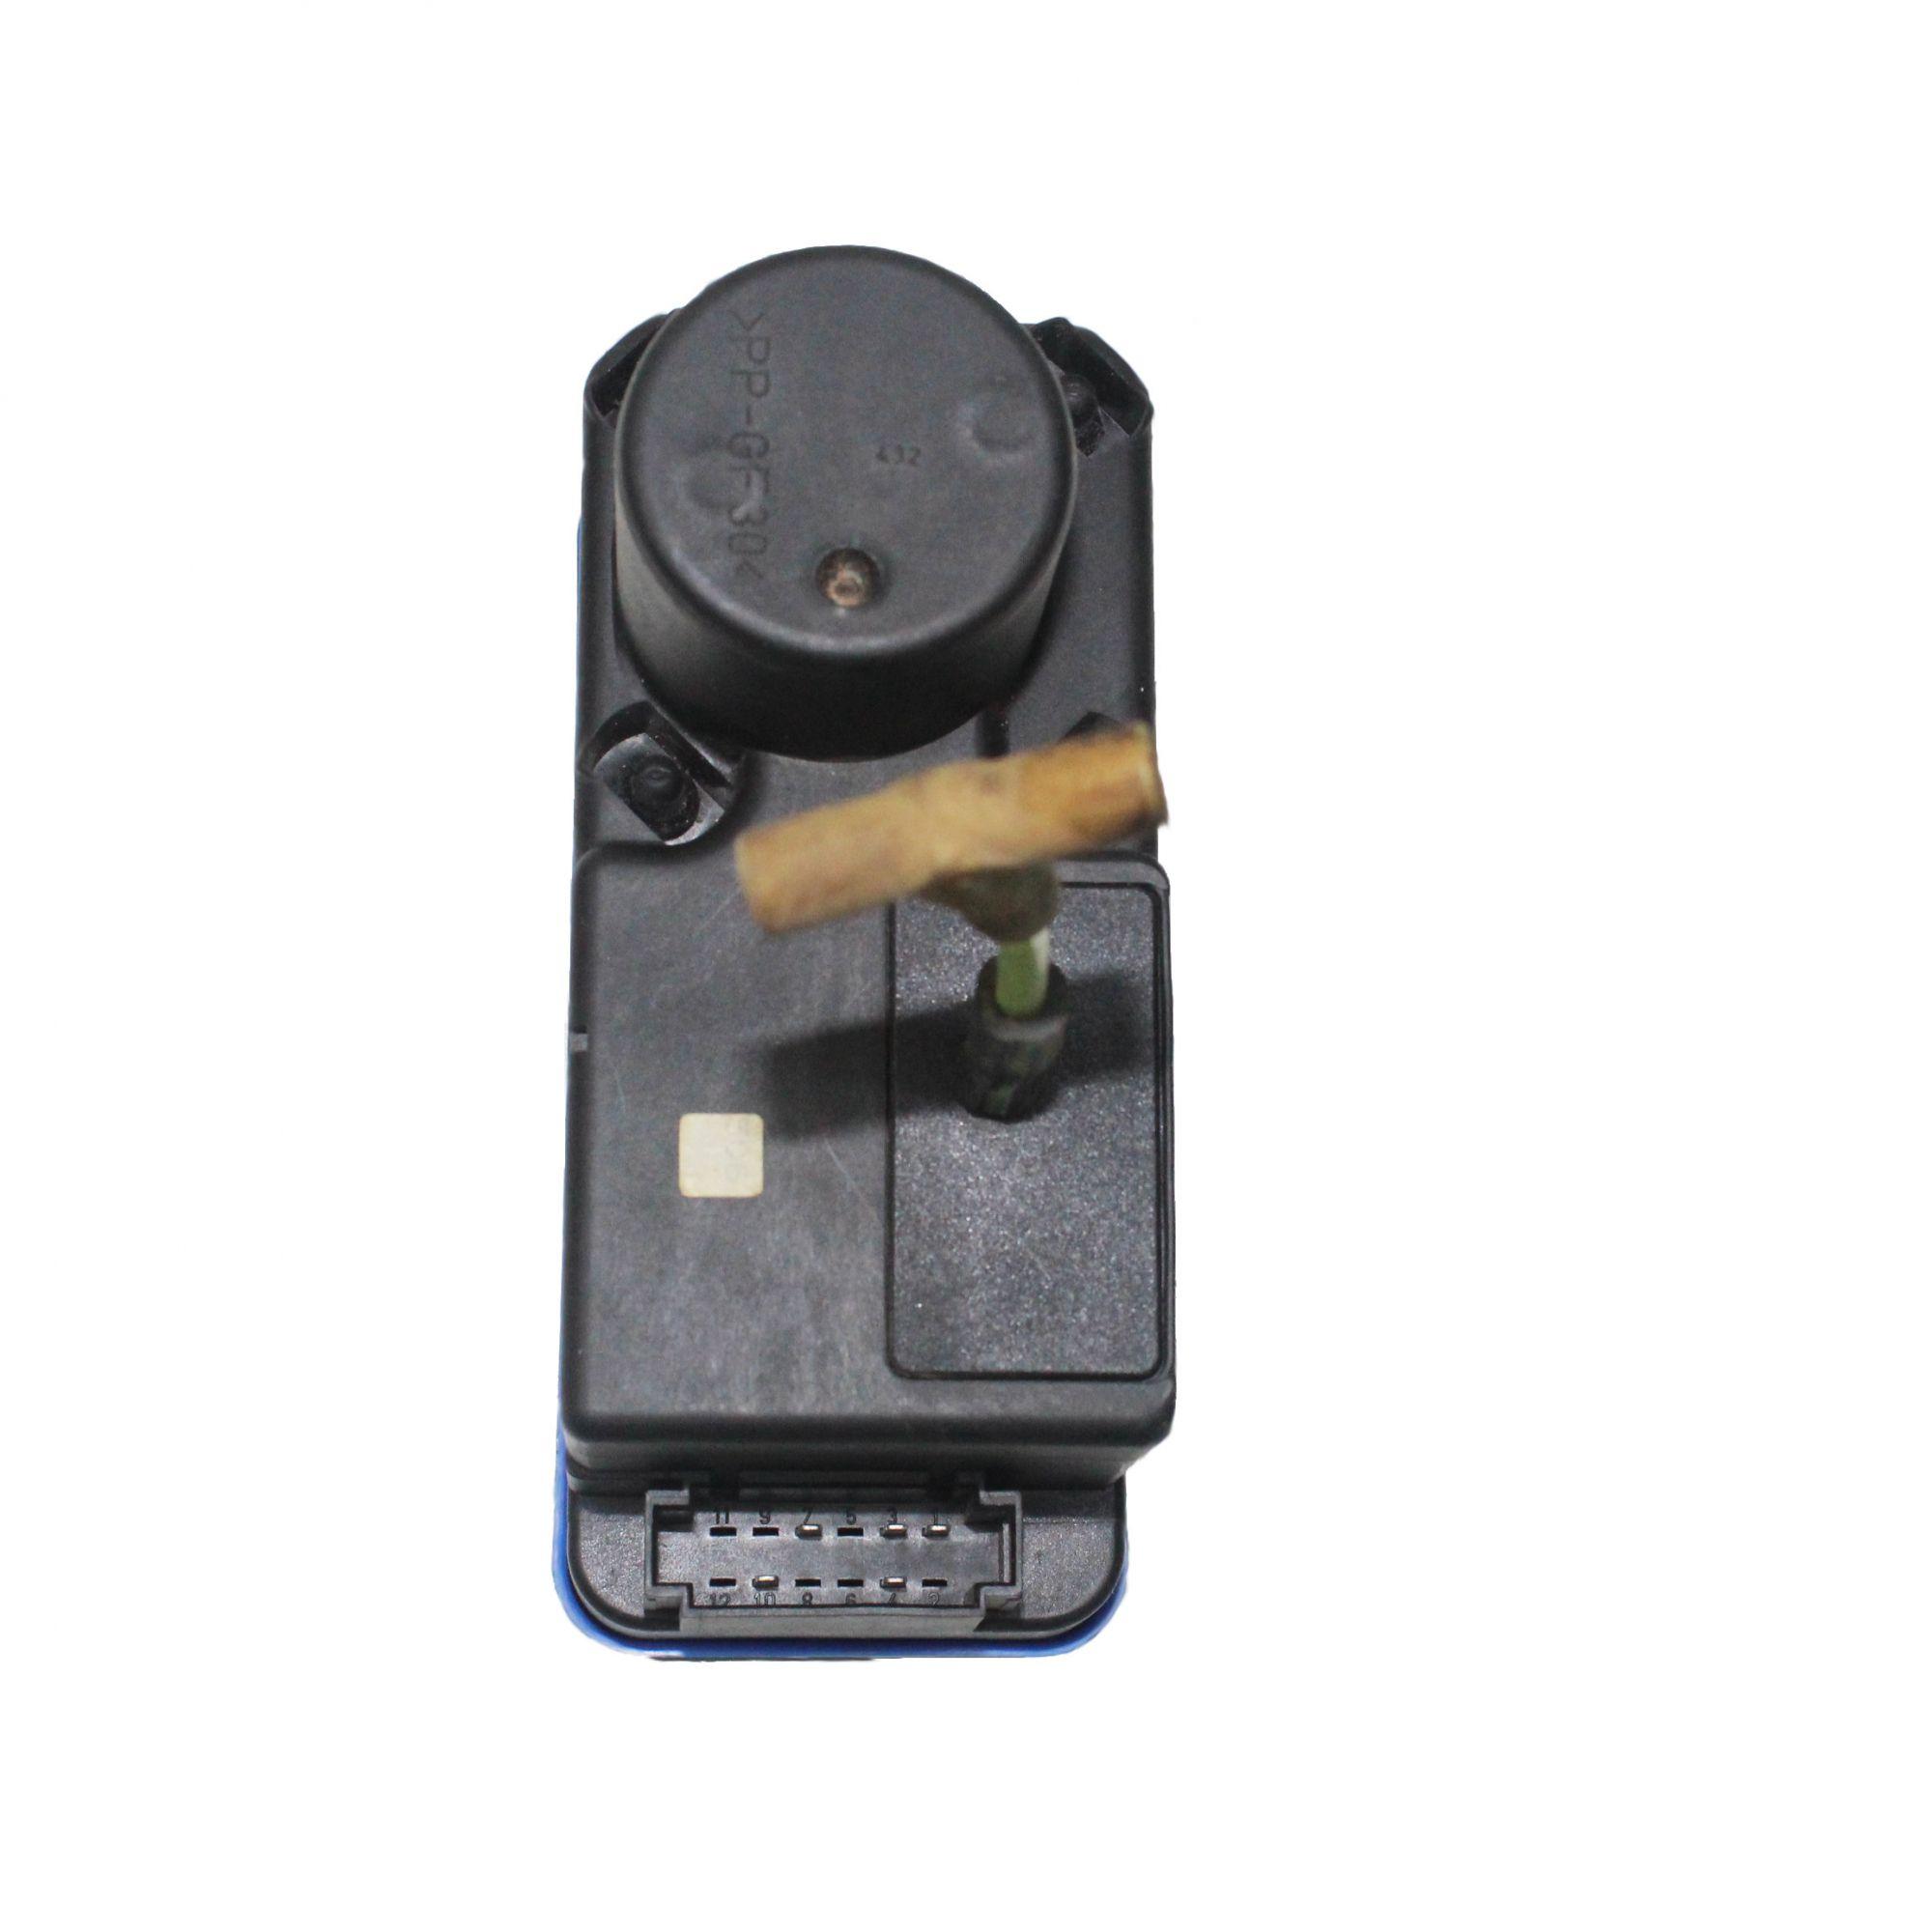 Bomba Vácuo Trava Portas Vw Golf Mk3 GTI 1994 1H0962257A